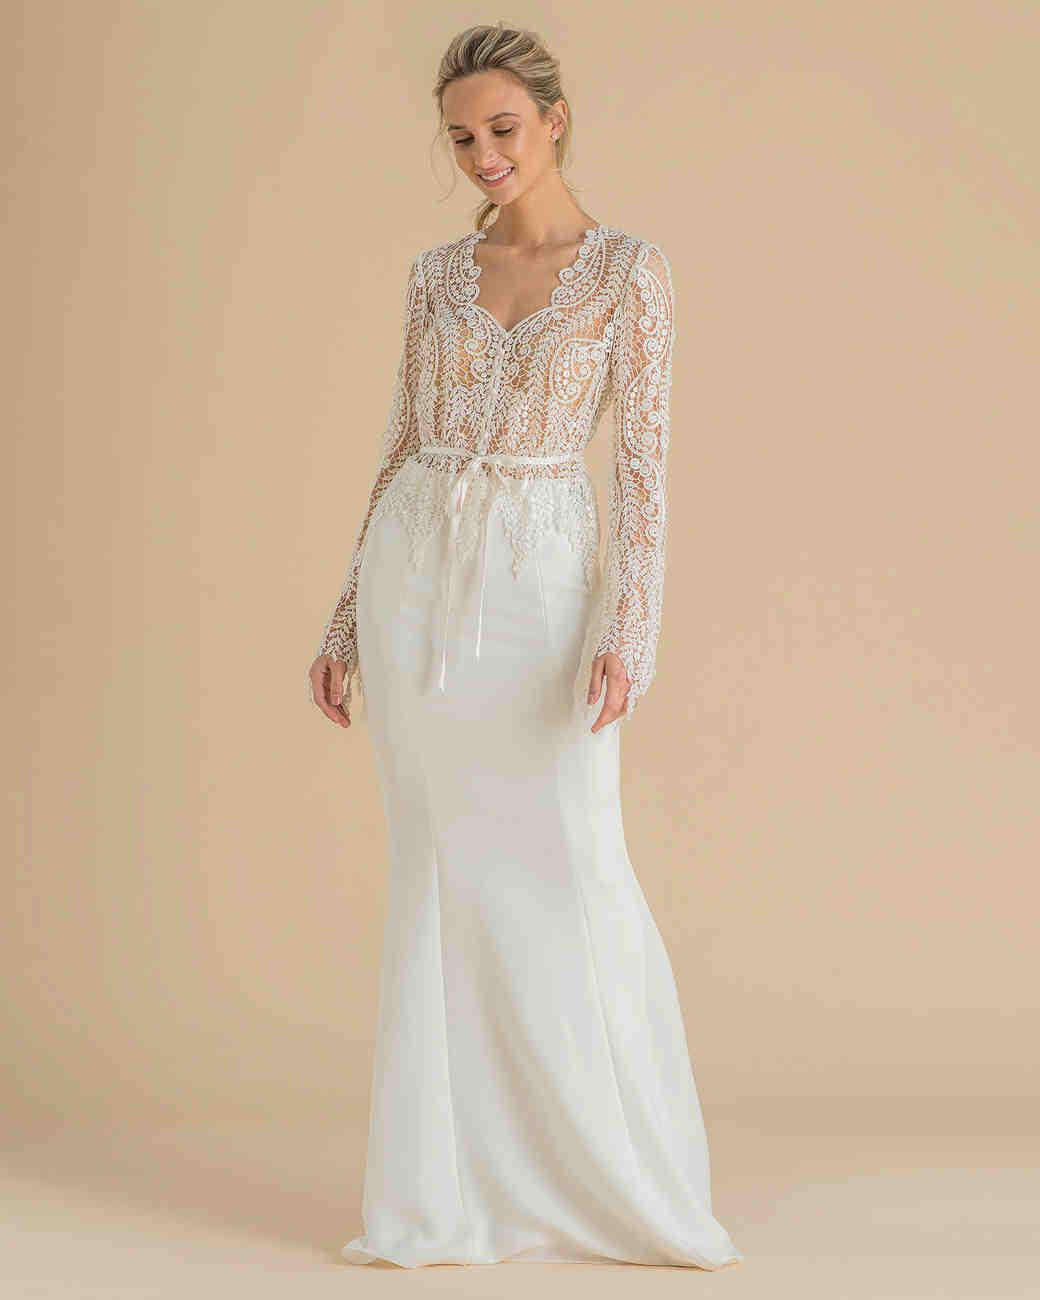 bb9e3afc5d4d Catherine Deane Spring 2019 Wedding Dress Collection | Martha Stewart  Weddings